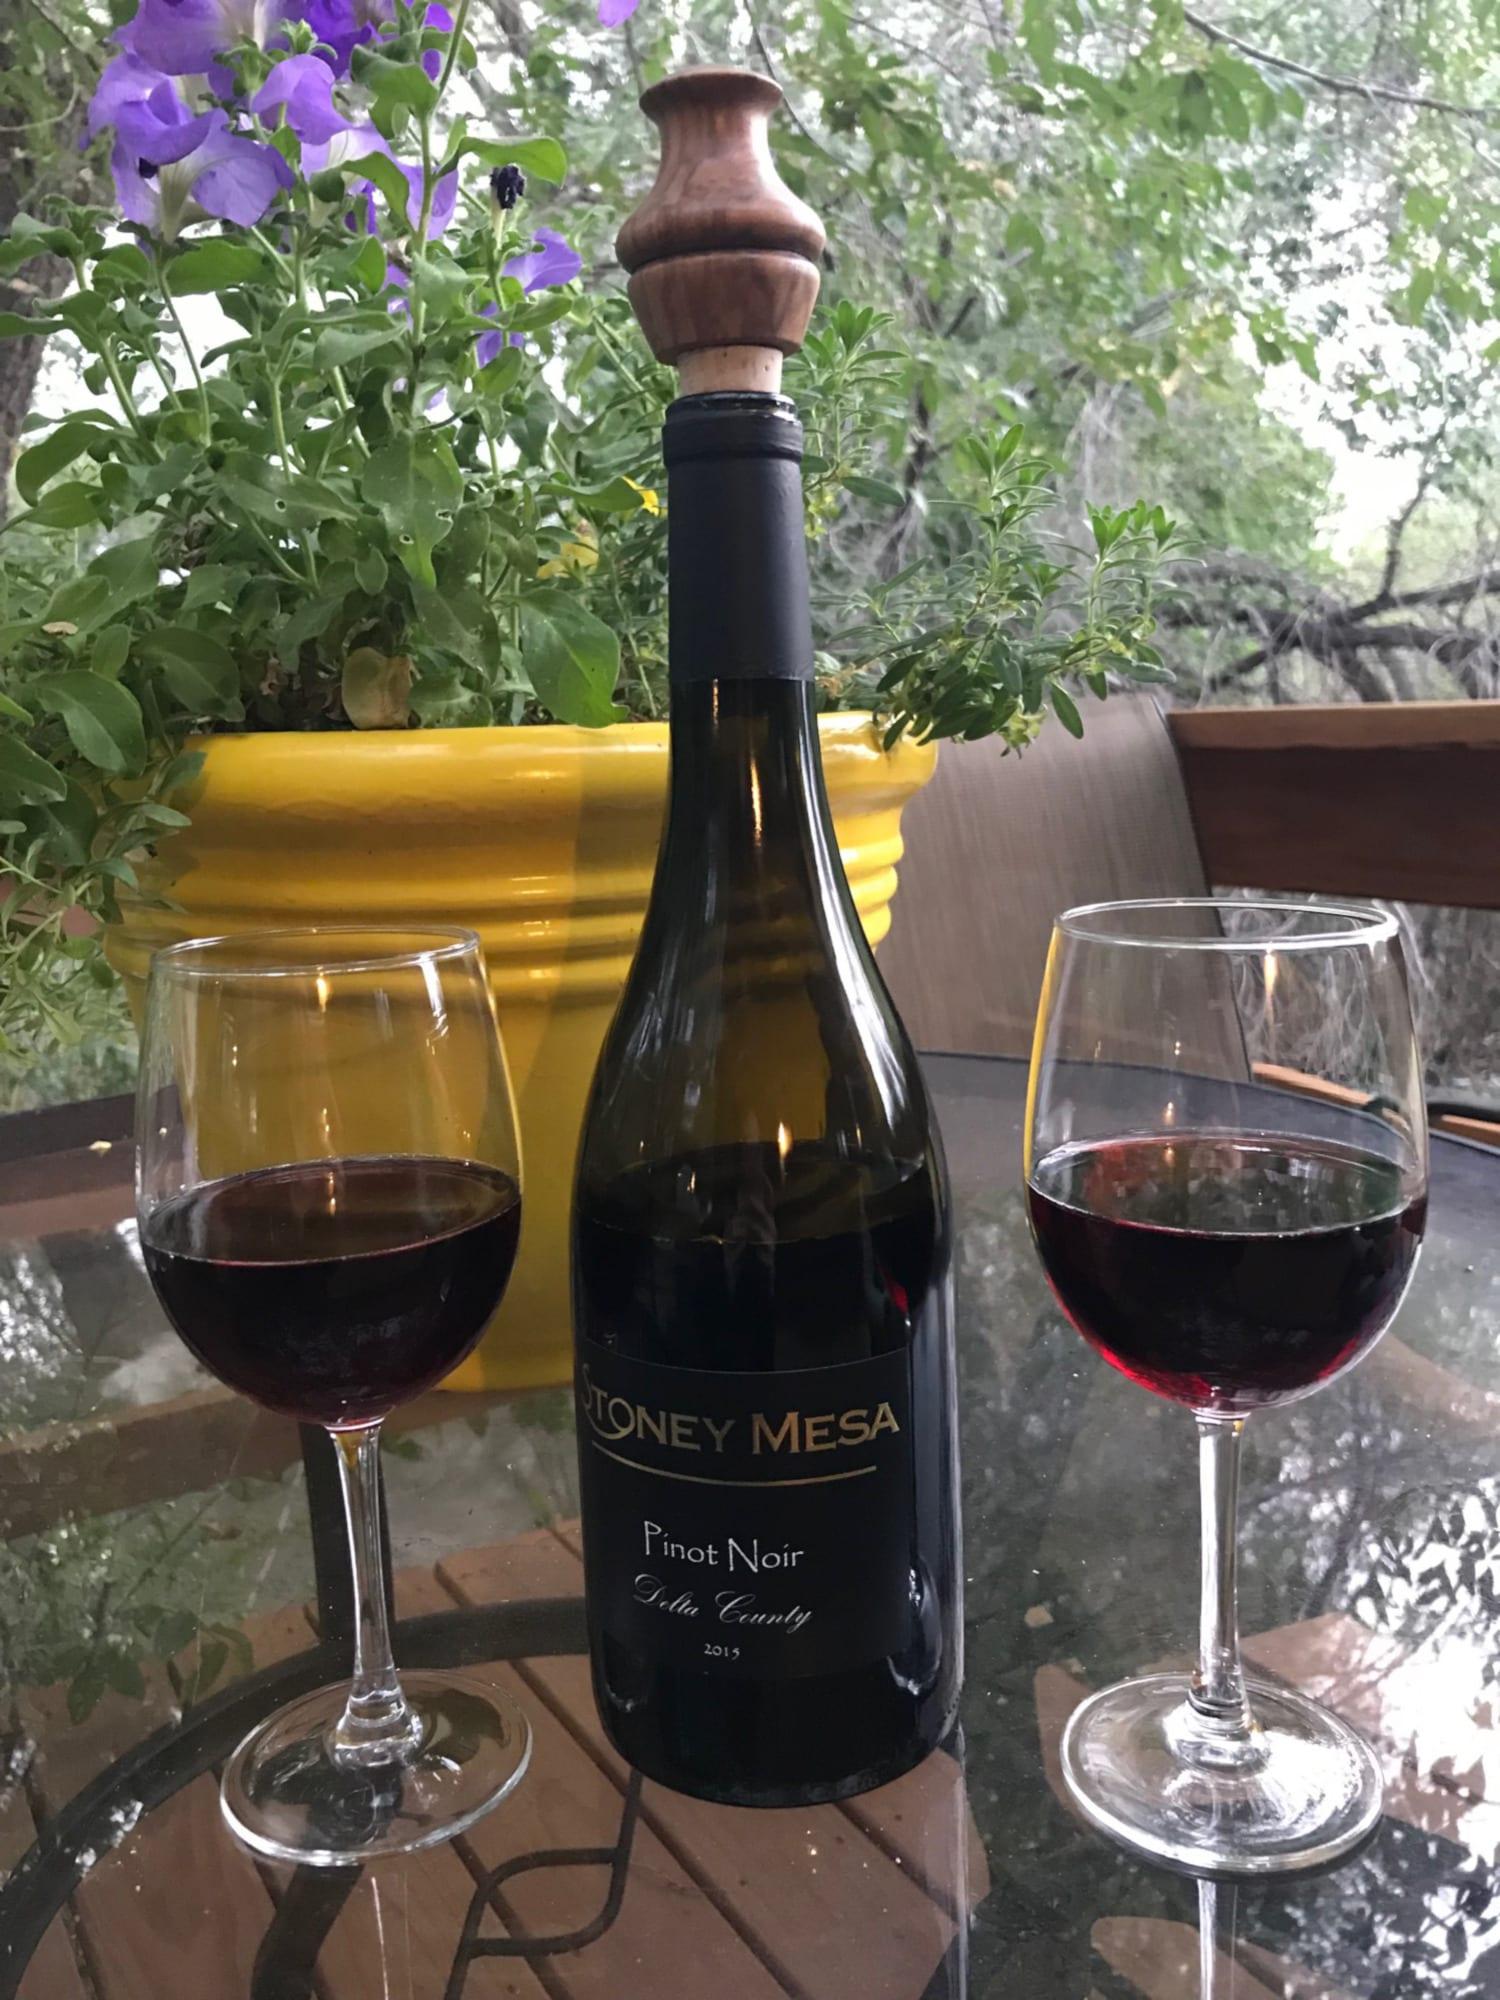 Stoney Mesa Winery Bottle of Pinot Noir